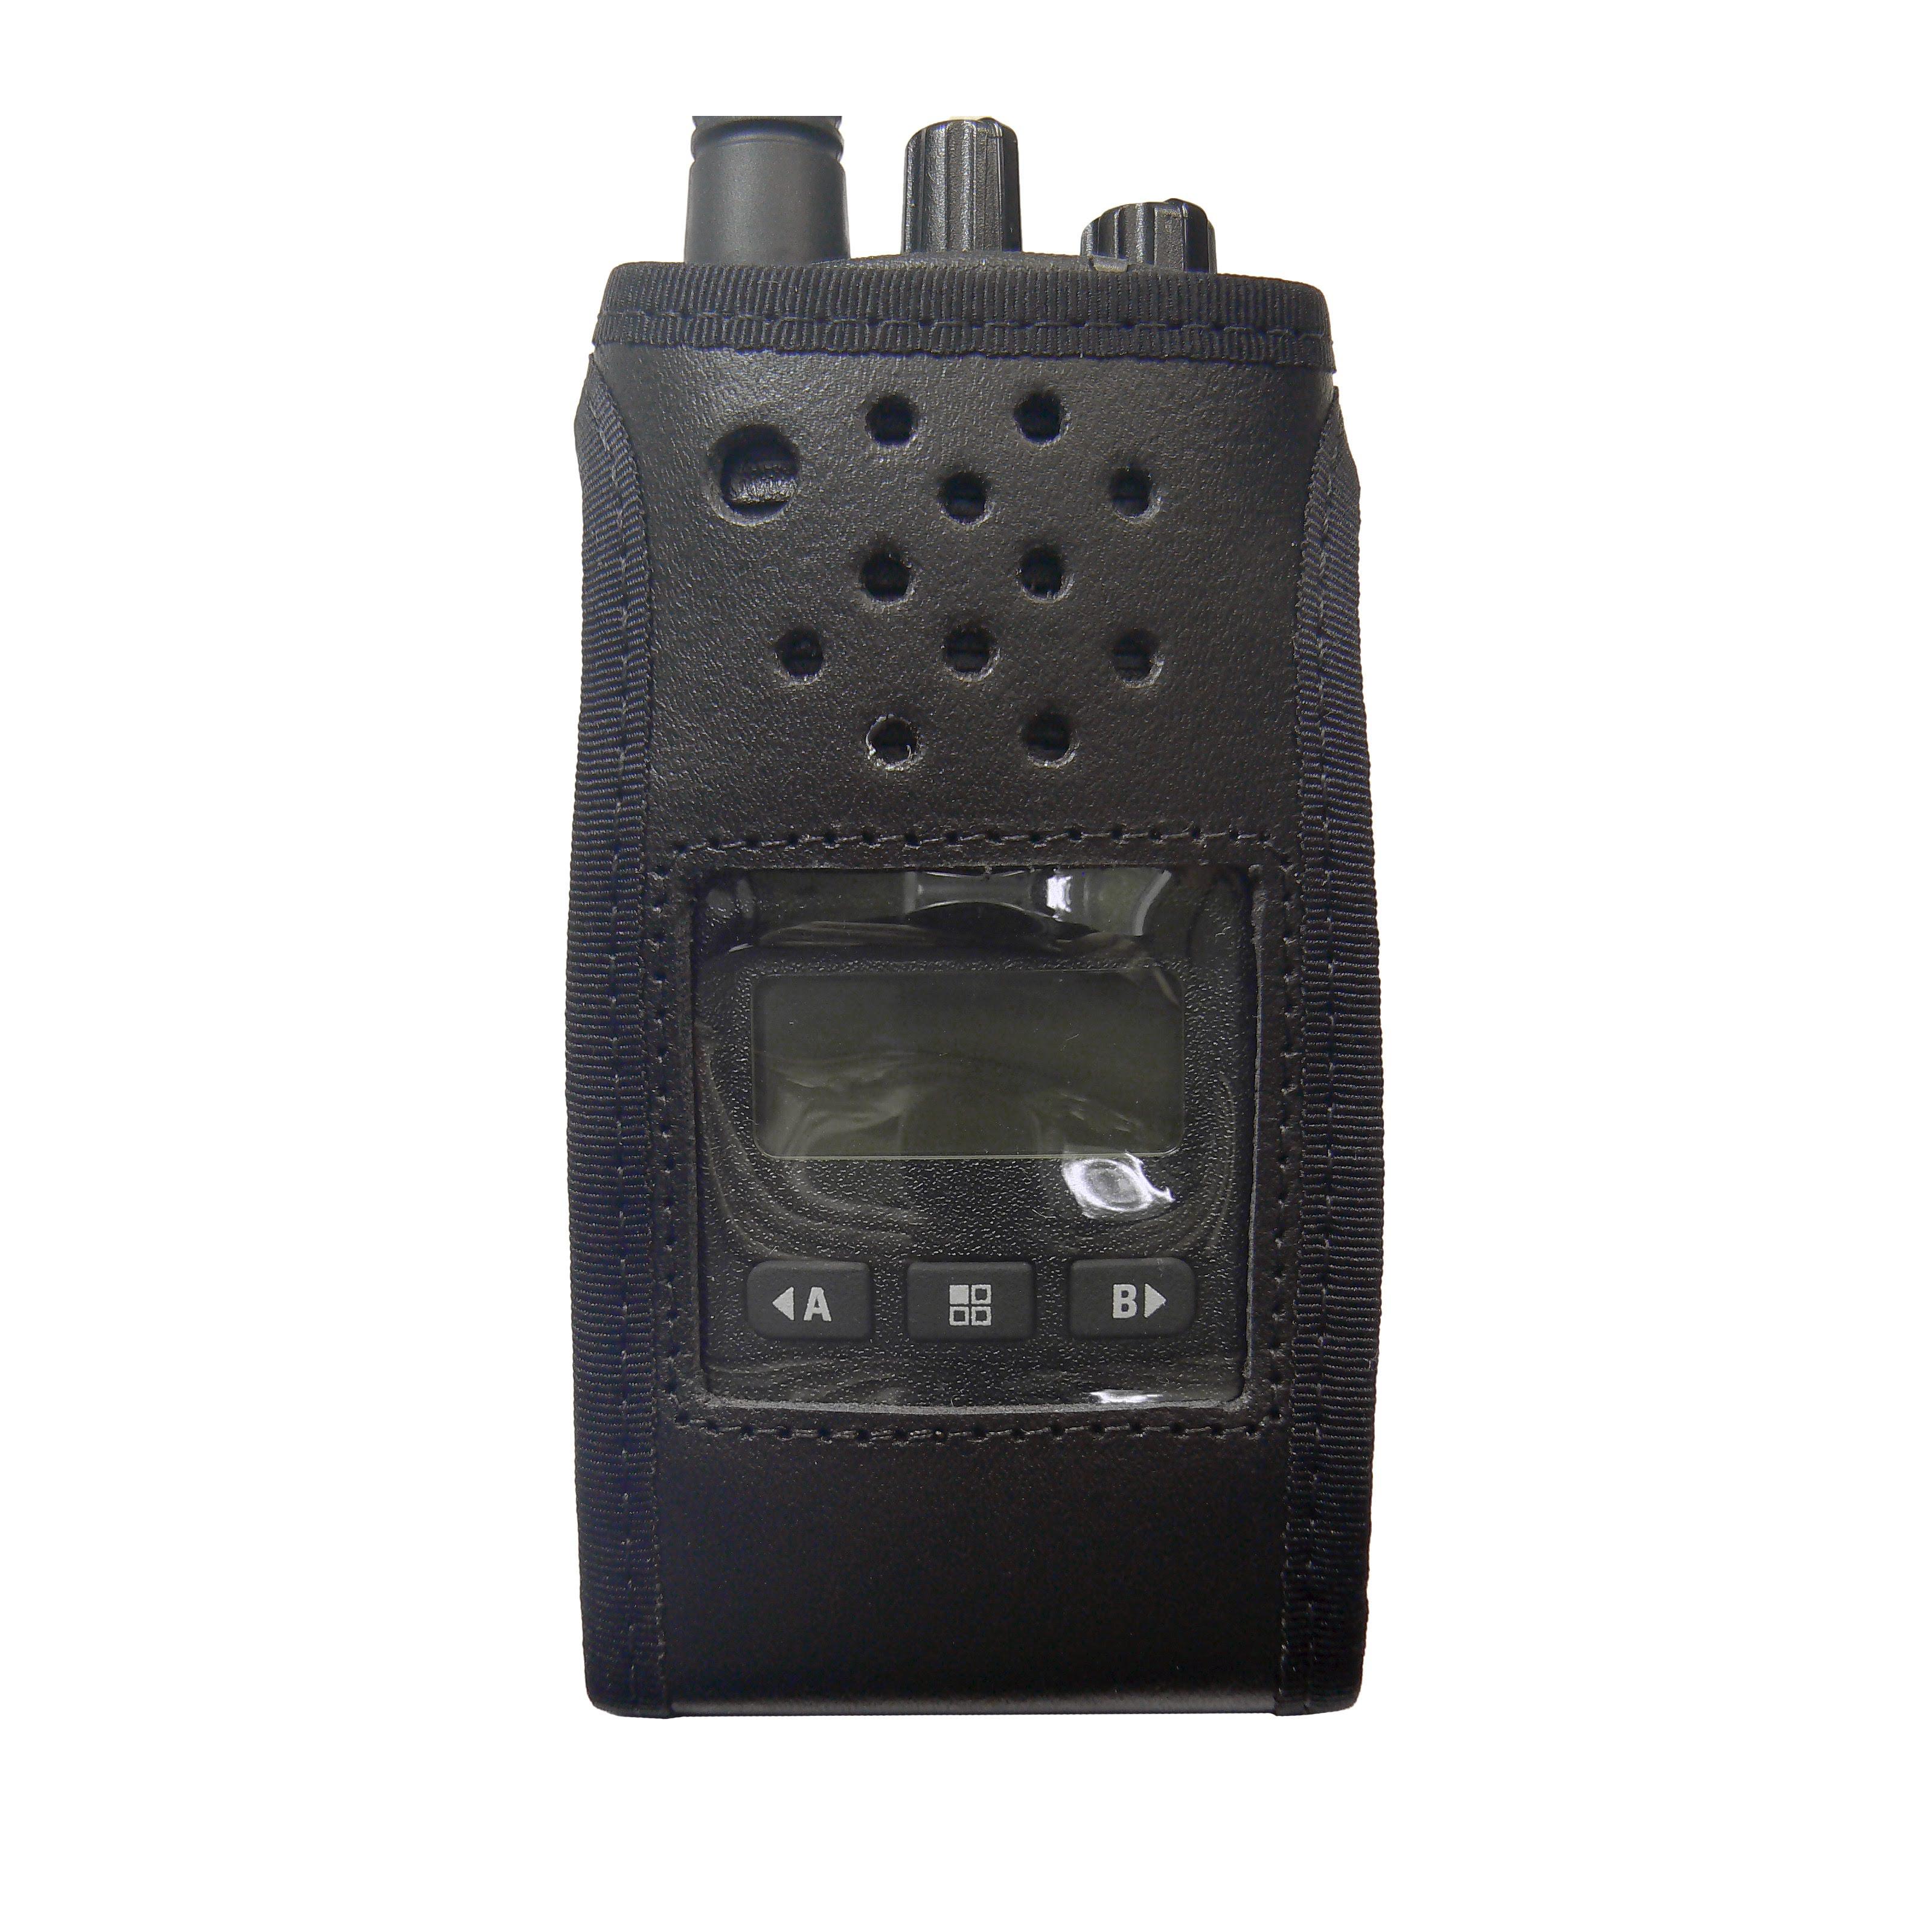 Motorola XT460 Radio Case Leather